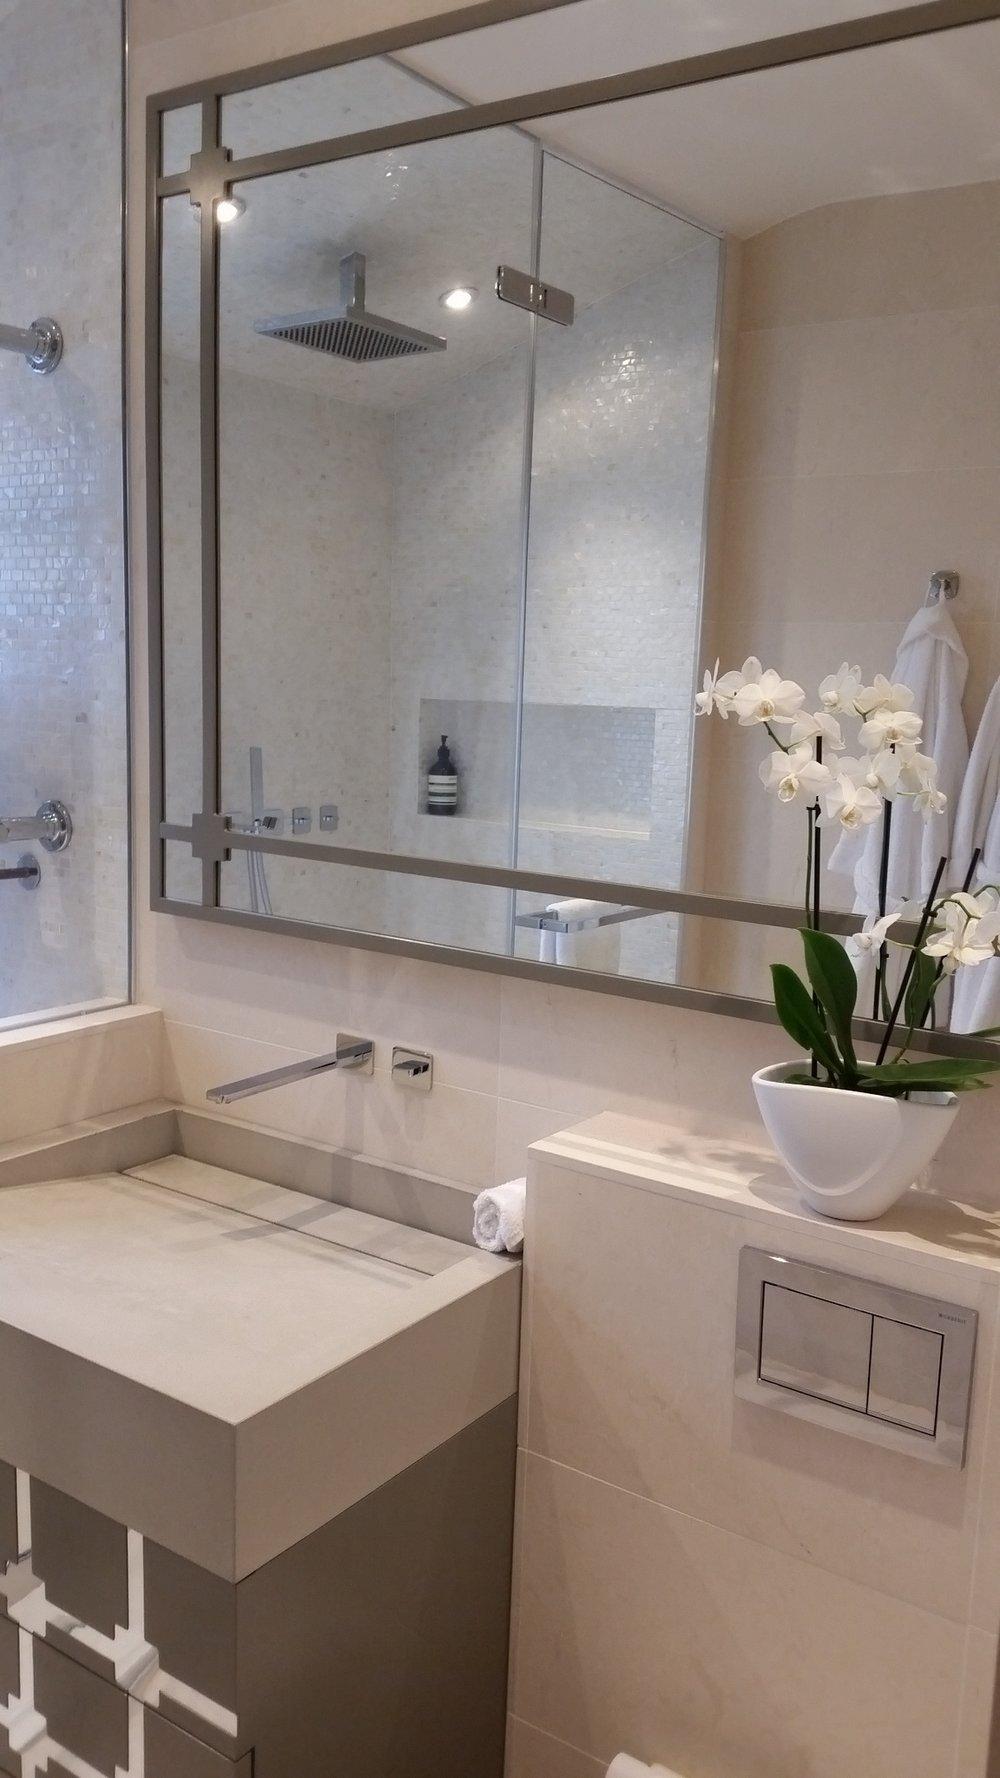 Balham Bathroom Renovation